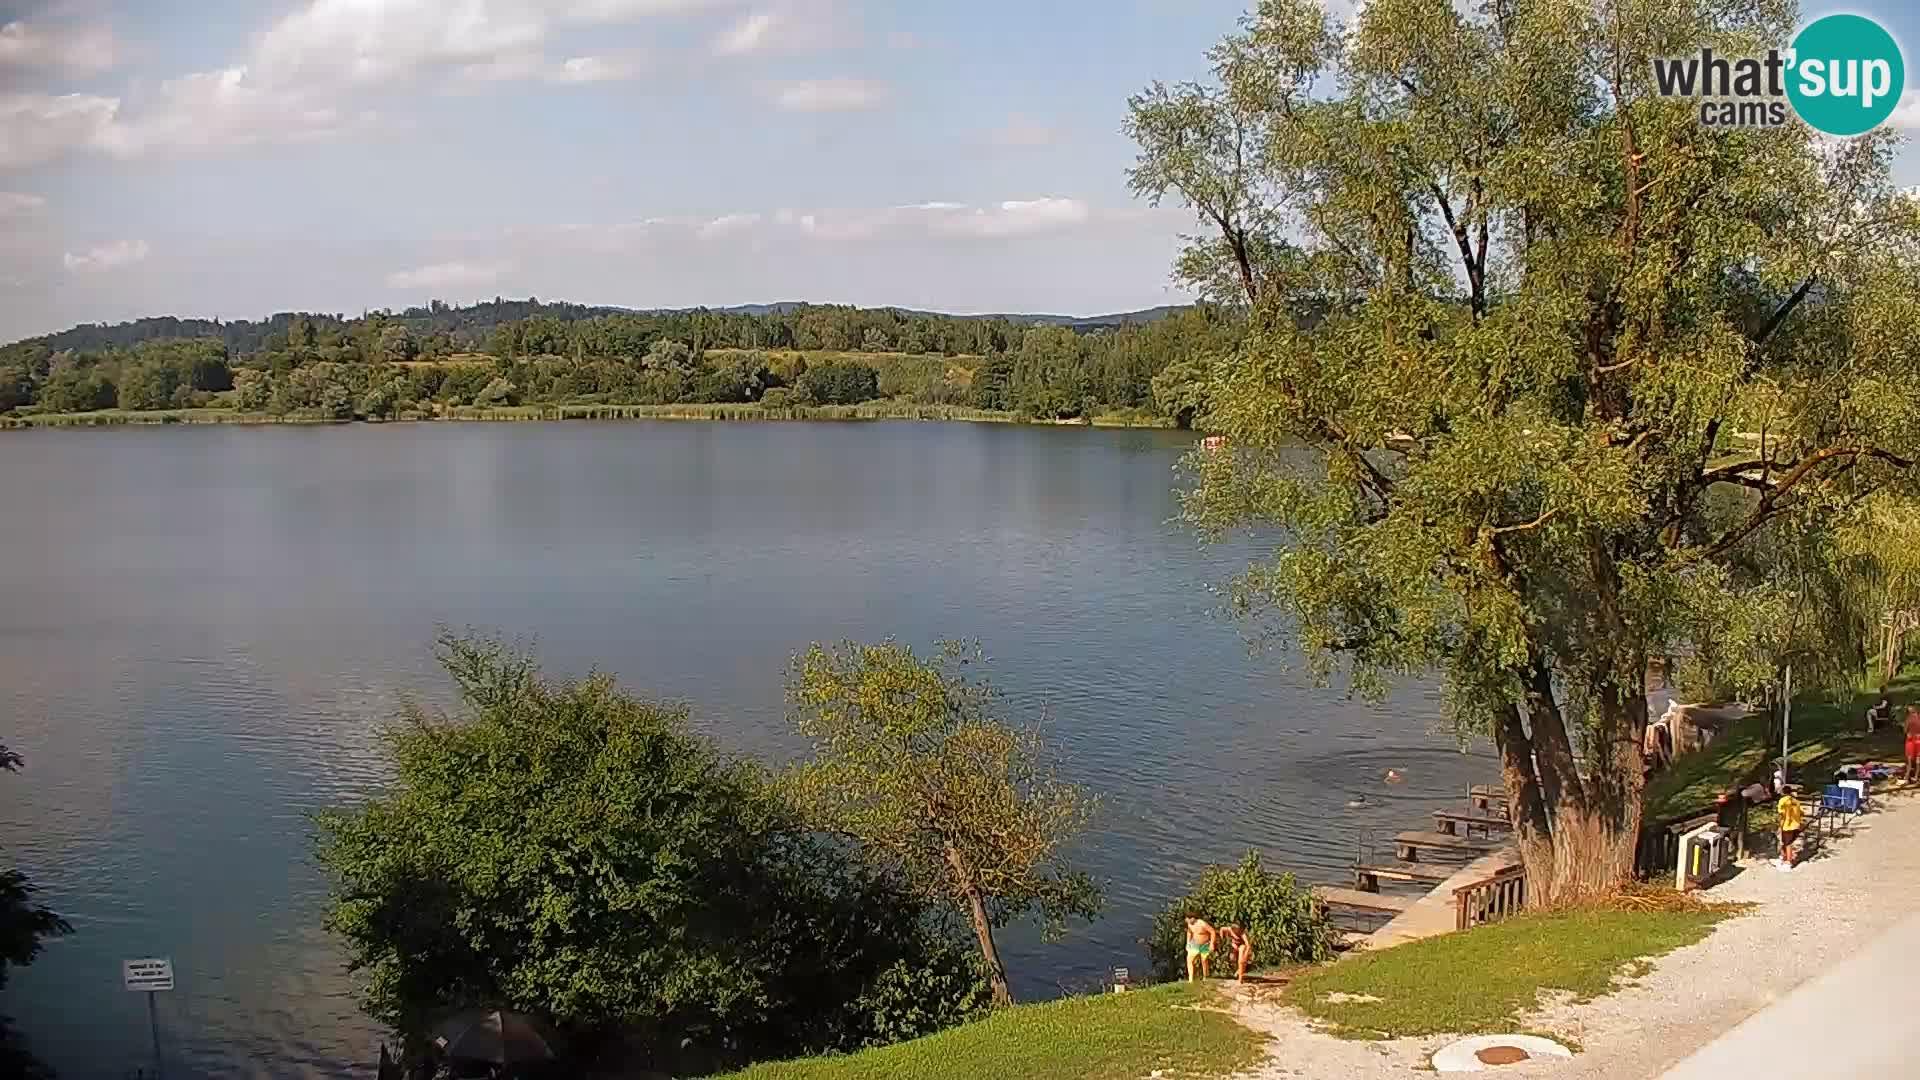 Livecam Lac Kočevje